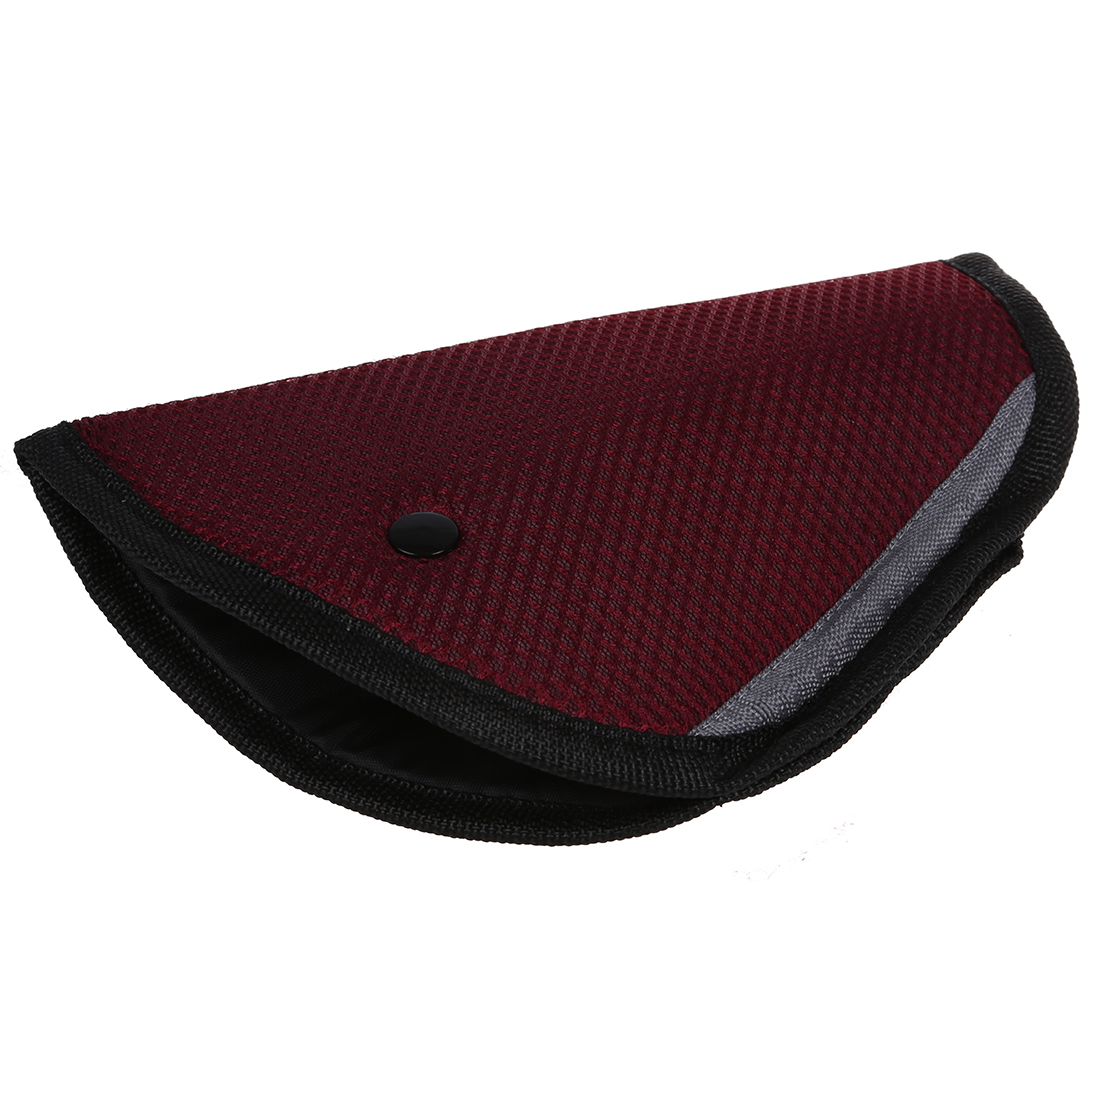 Car Accessories Comfortable Child Car Seat Belt Holder e Claret